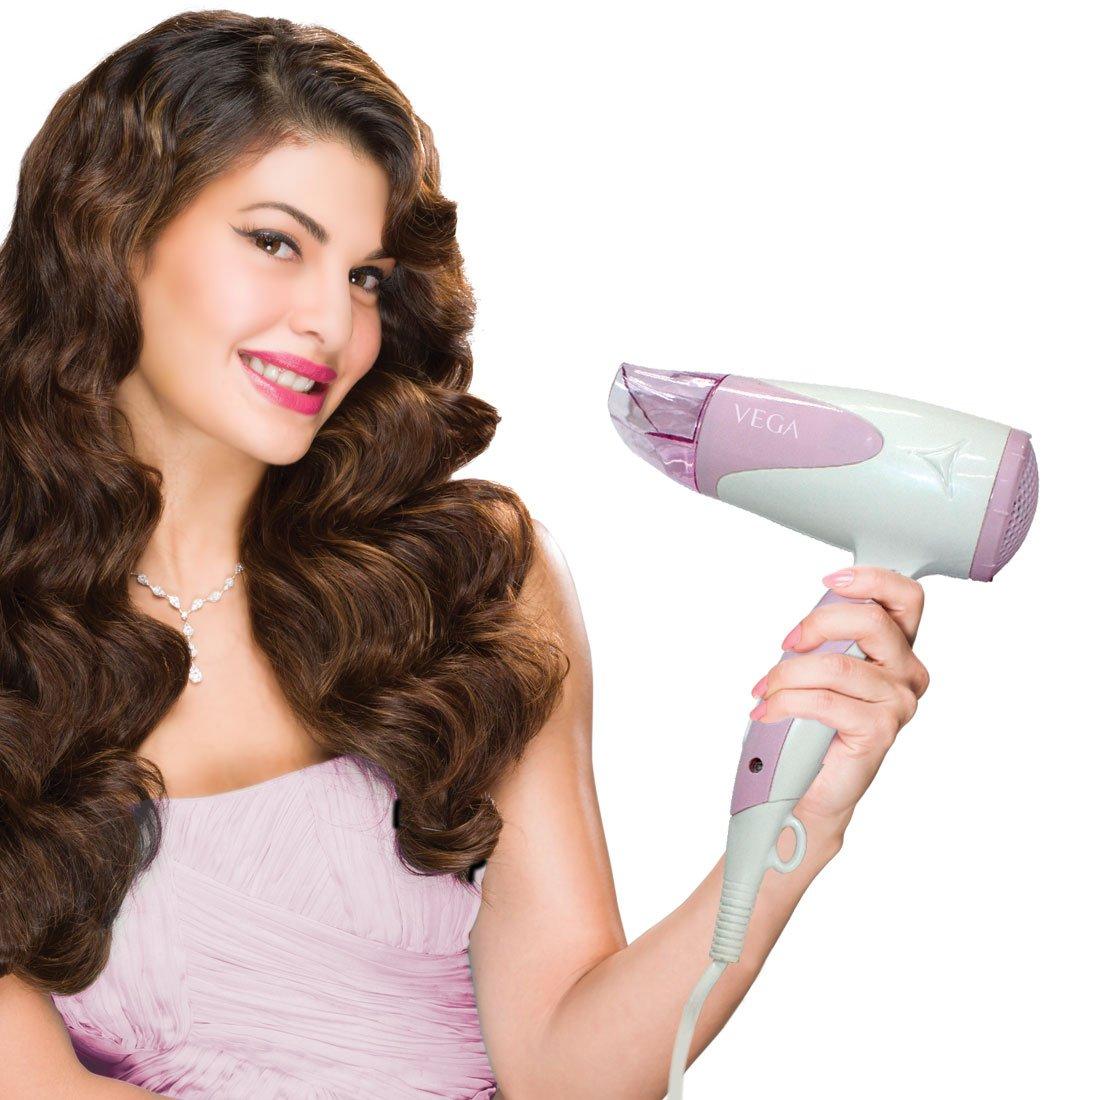 Vega Blooming Air VHDH-05 Hair Dryer - Pink And White